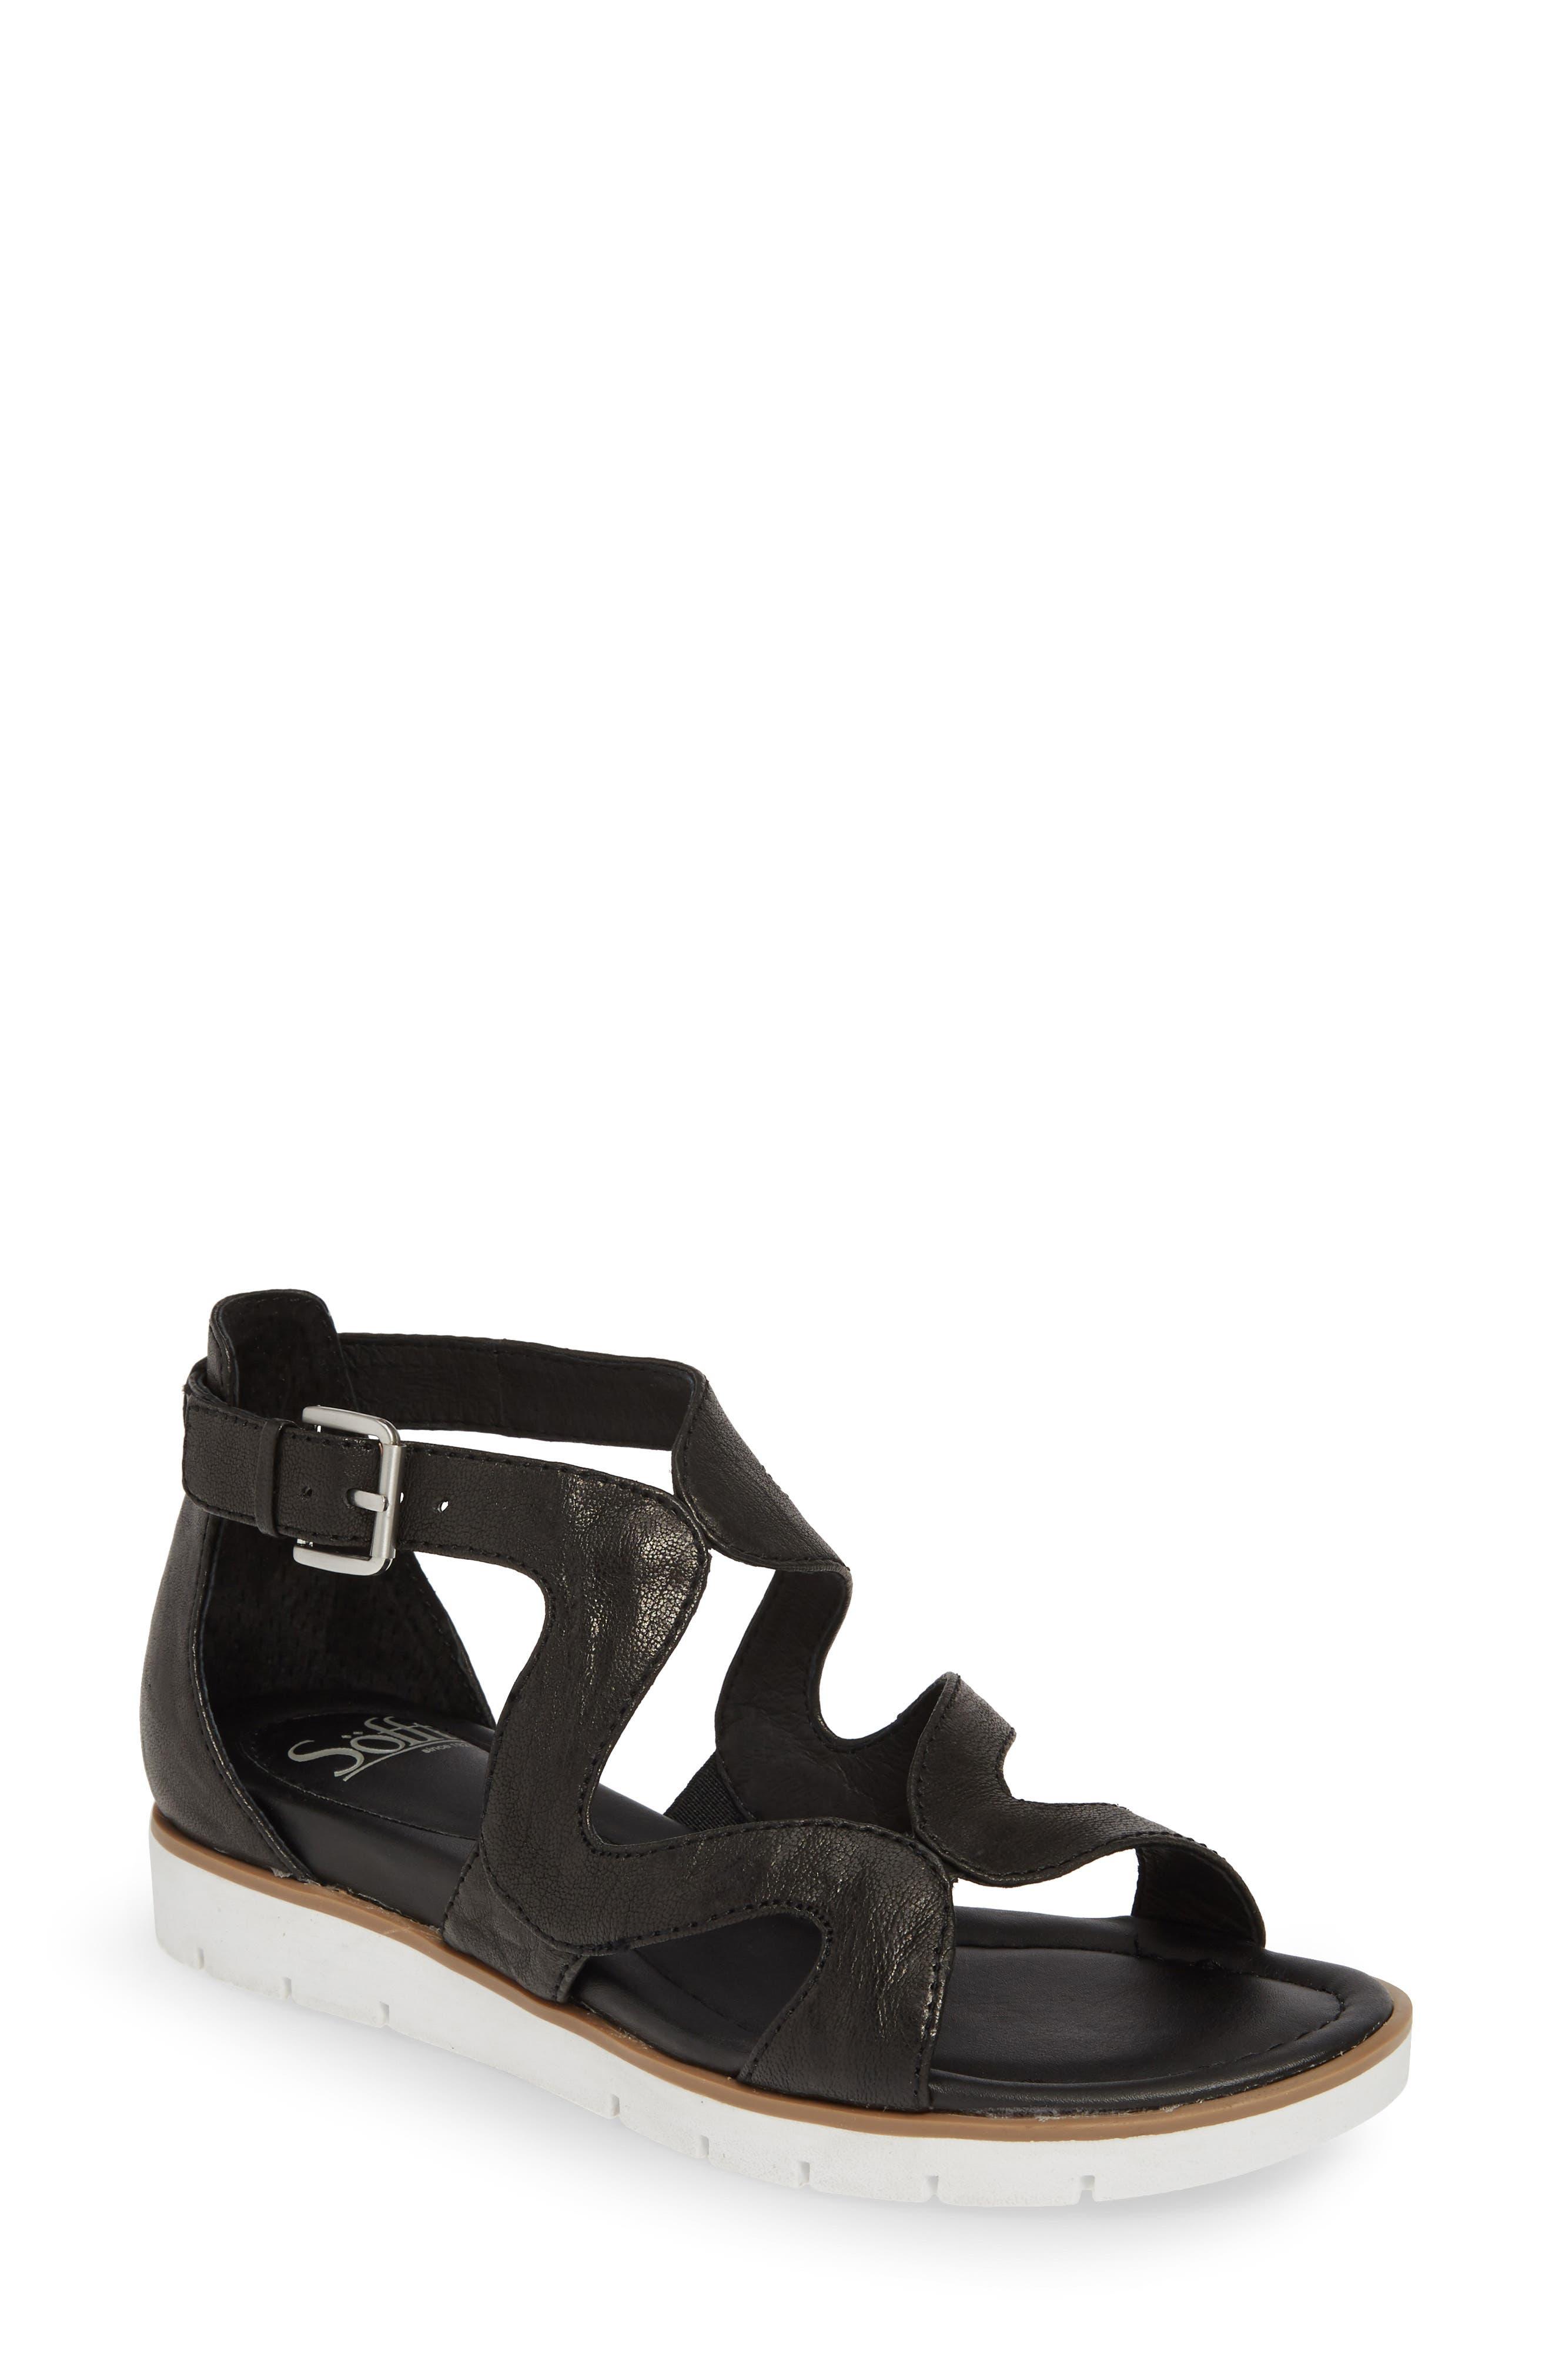 SÖFFT, 'Malana' Leather Sandal, Main thumbnail 1, color, BLACK LEATHER